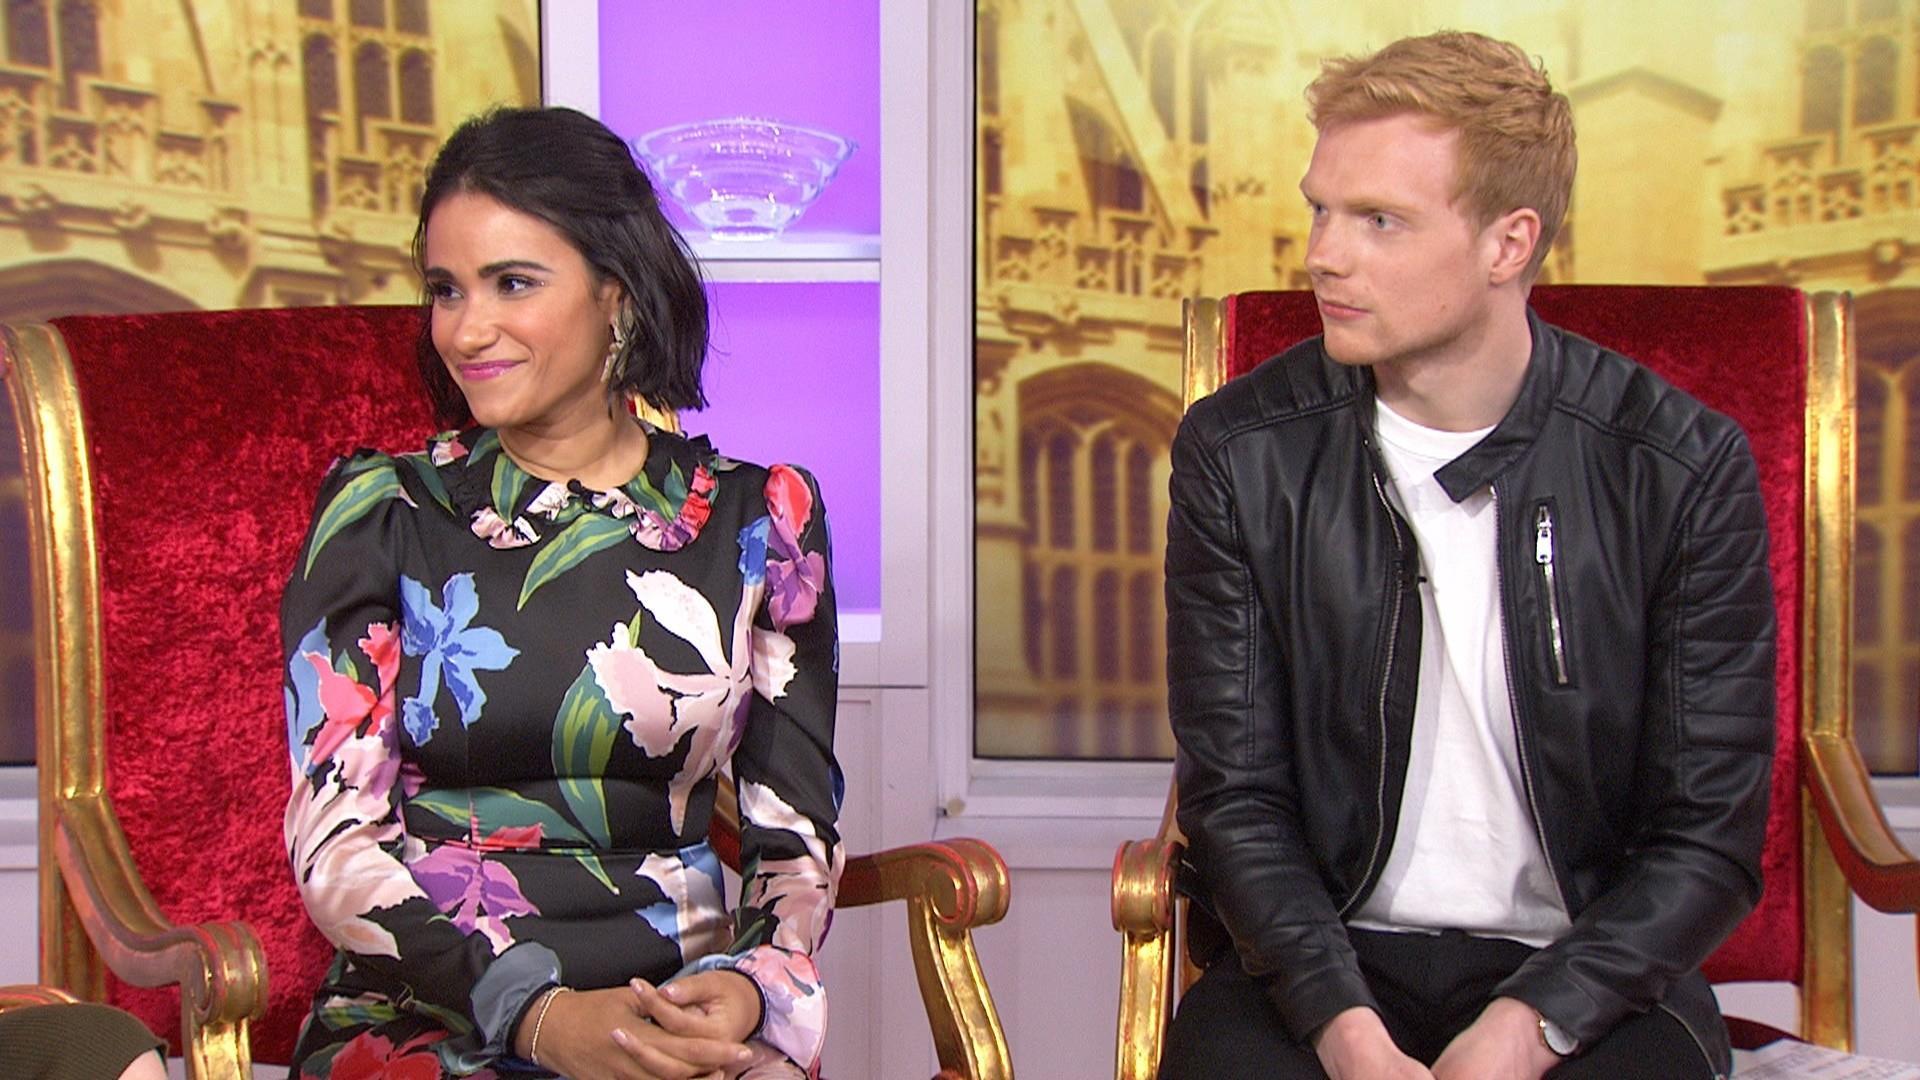 Lifetime's 'Becoming Royal' actors dish on playing Prince Harry and Meghan Markle